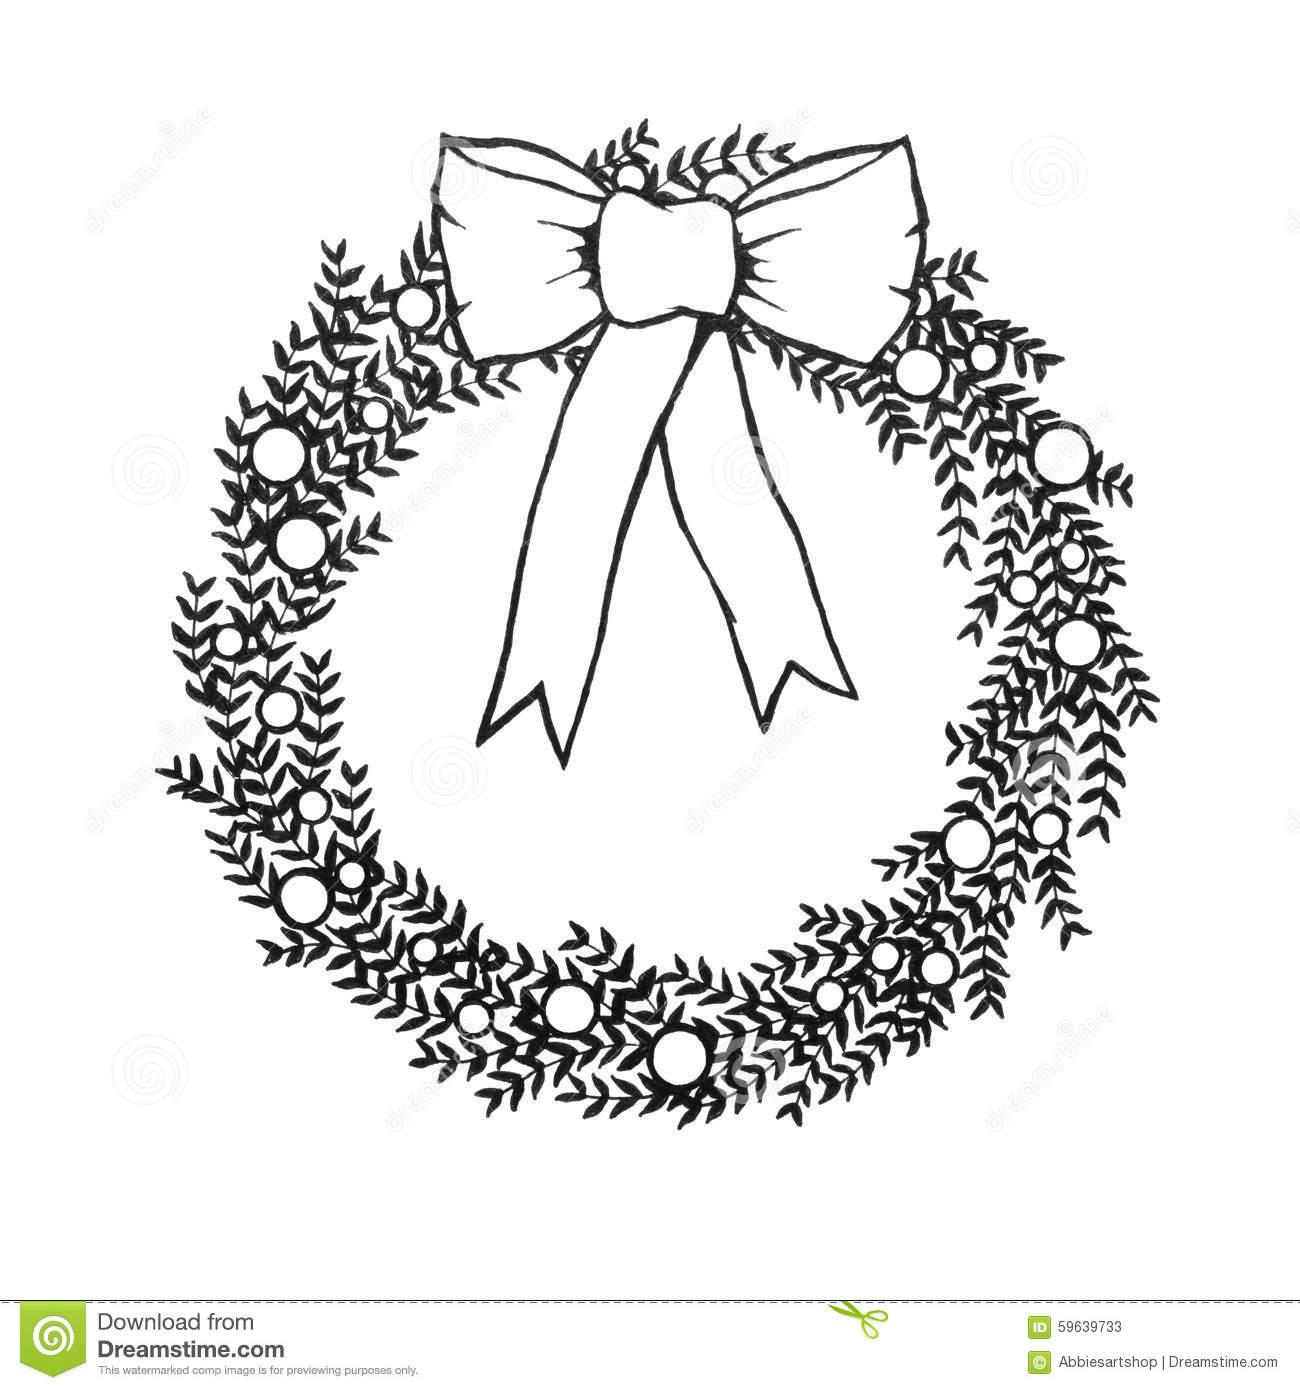 Black And White Christmas Wreath With Bow, Hand Drawn Illustraiton.